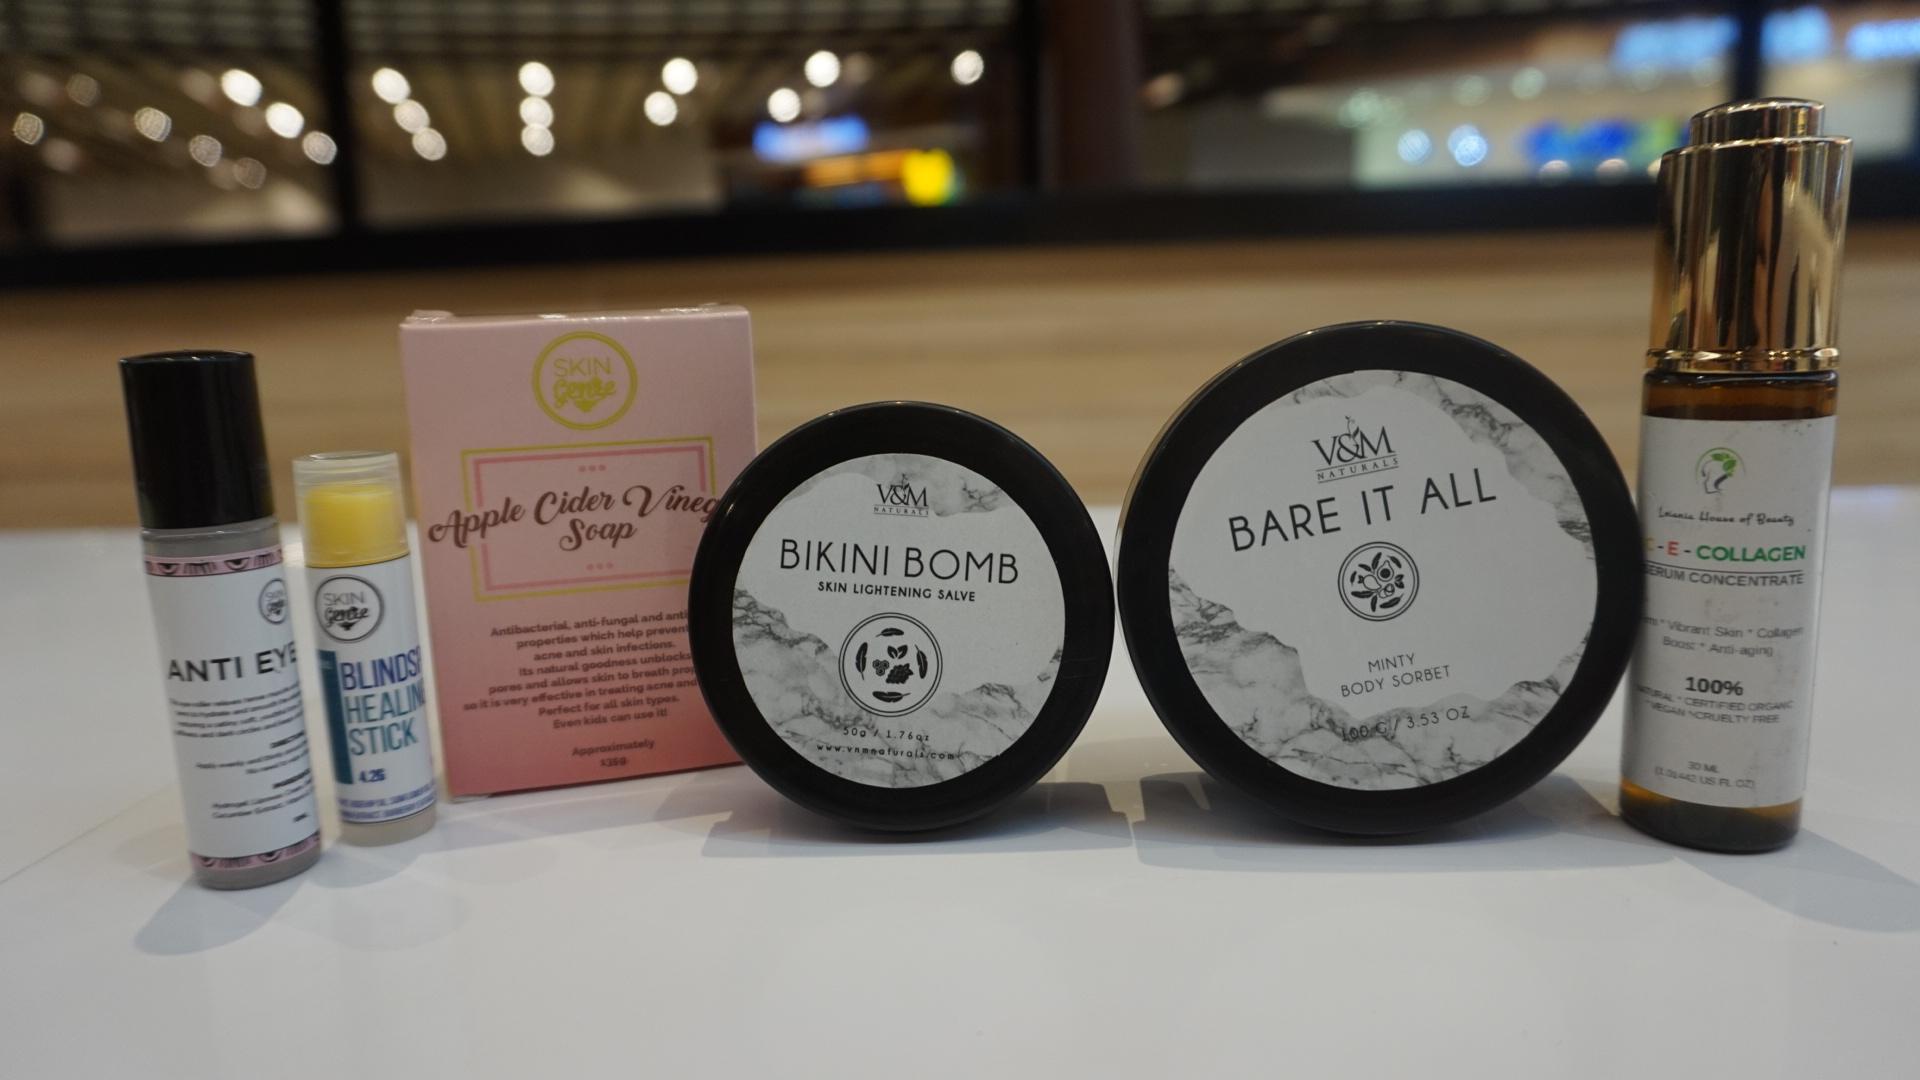 Product Reviews: Vu0026M Naturals, Skin Genie, Leiania House Of Beauty U0026 More